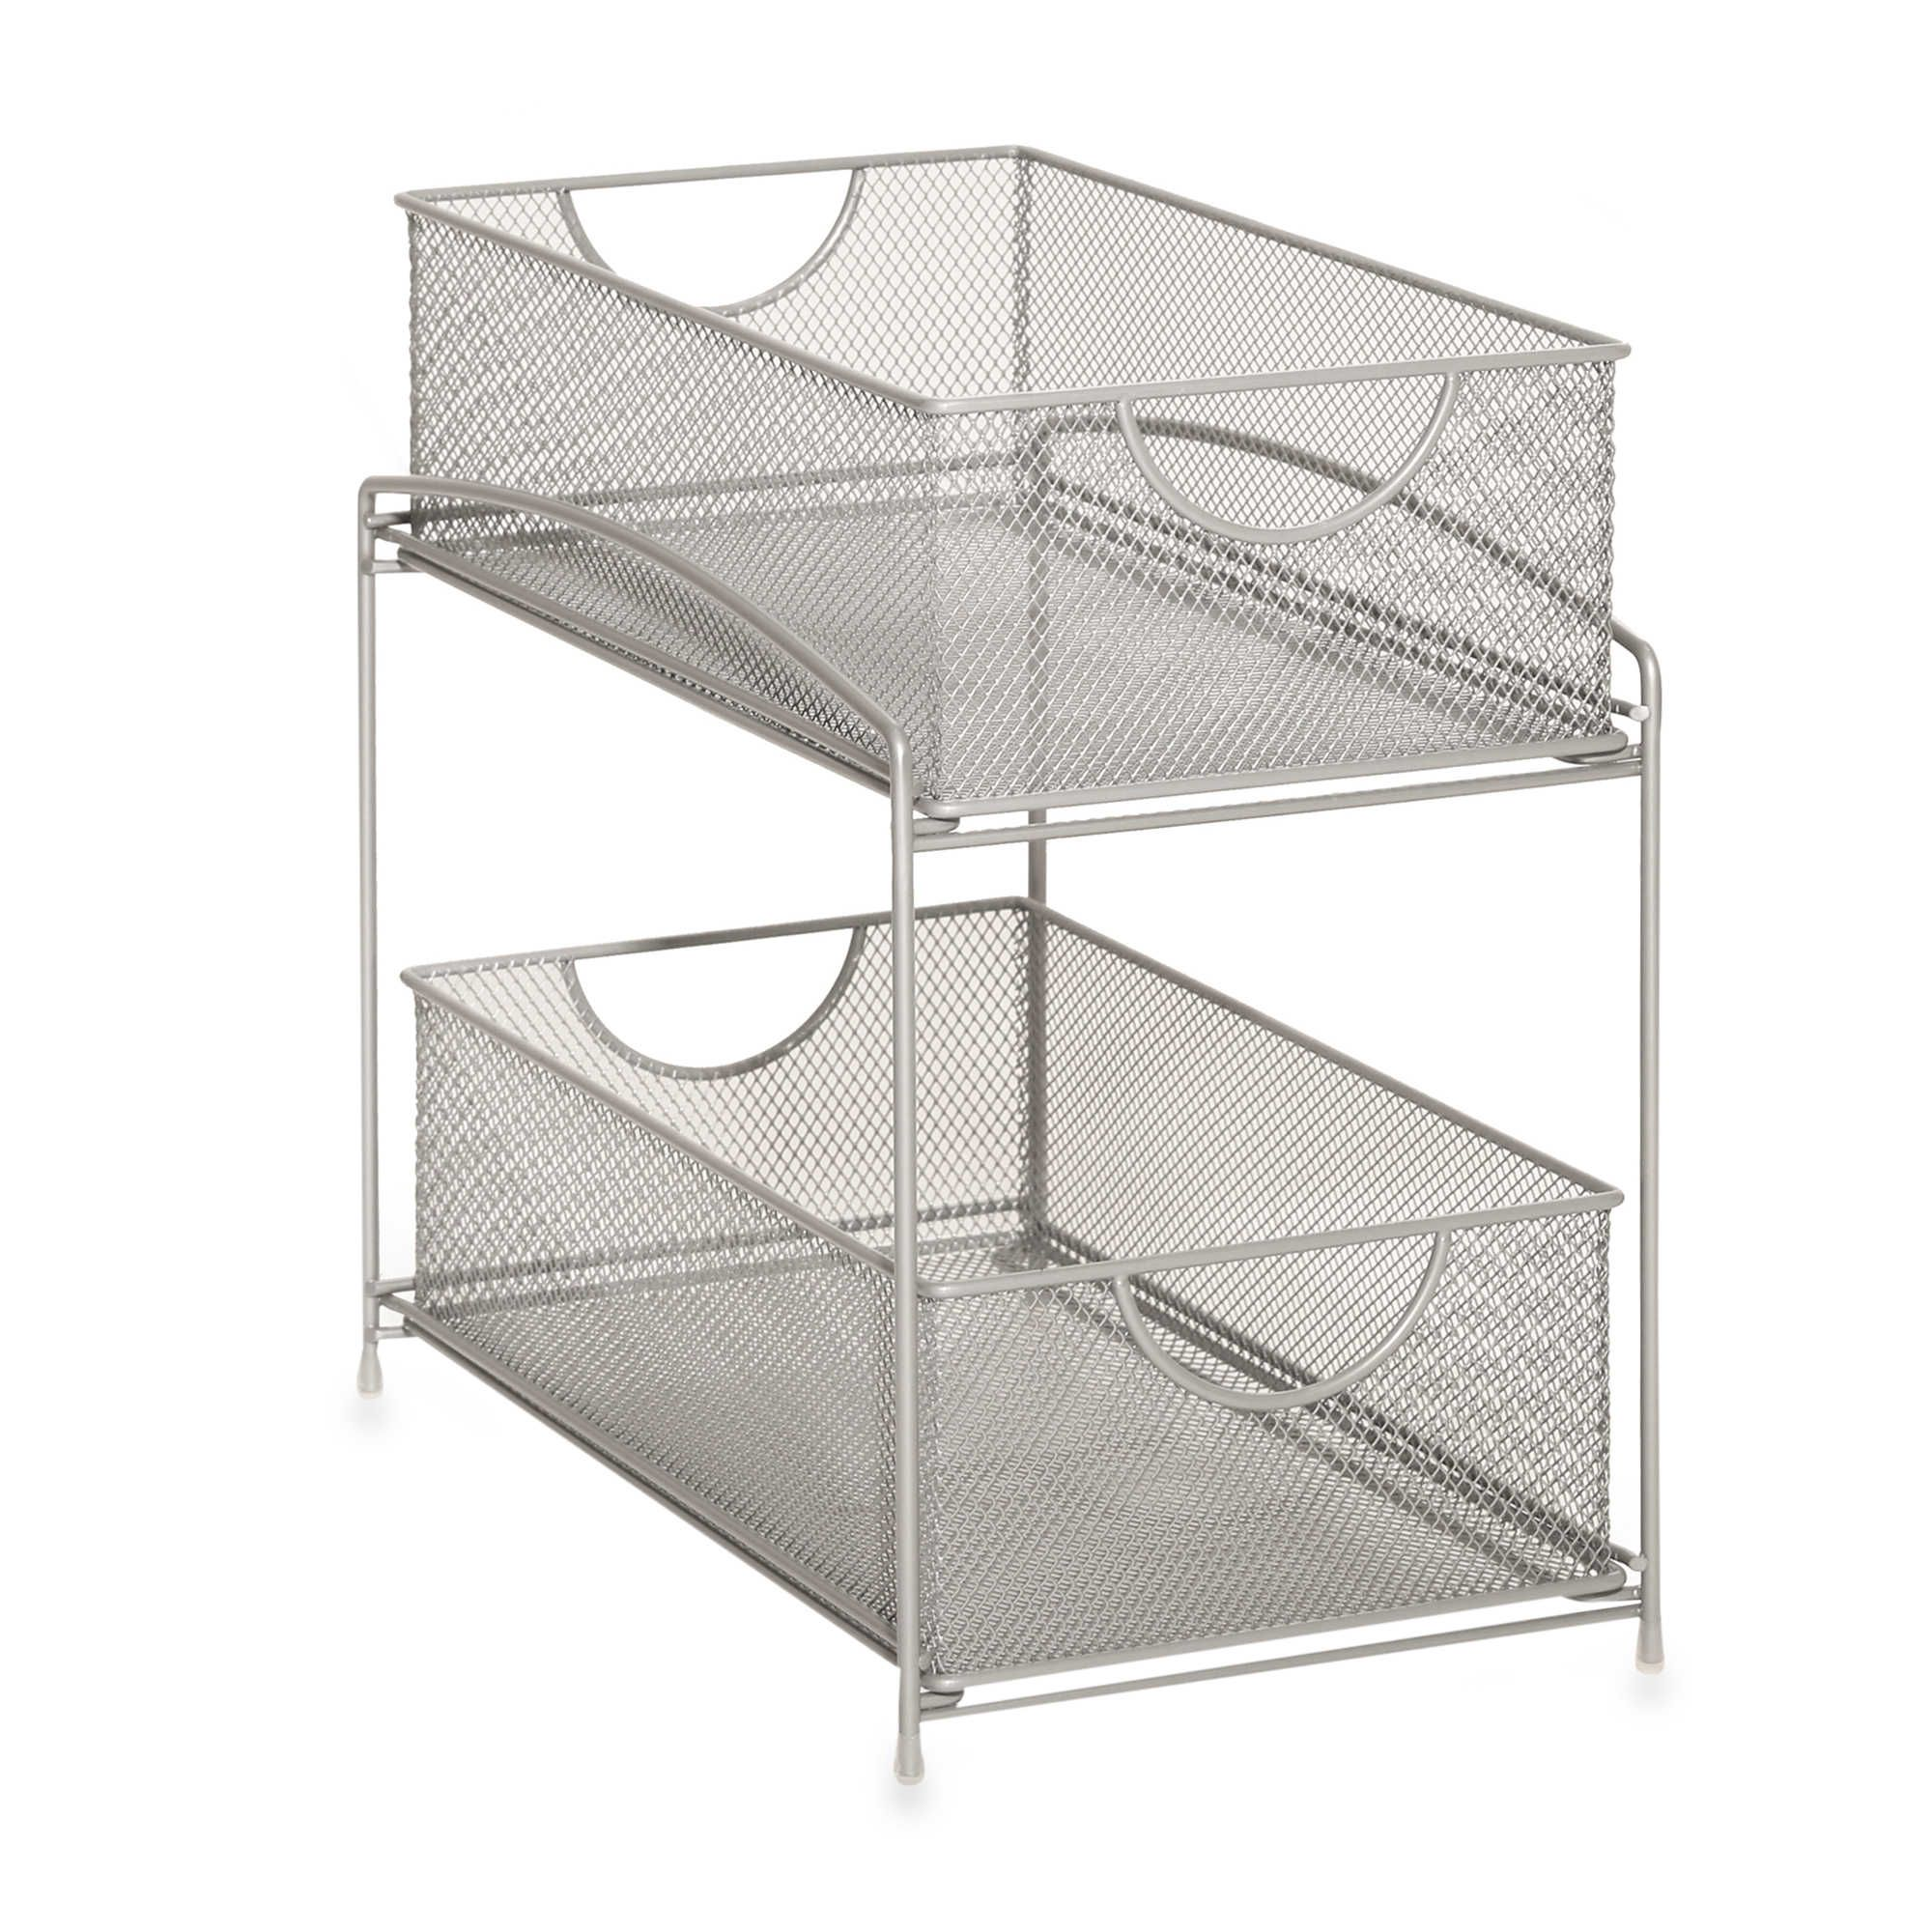 ORG™ Mesh 2 Tier Sliding Cabinet Basket in Silver